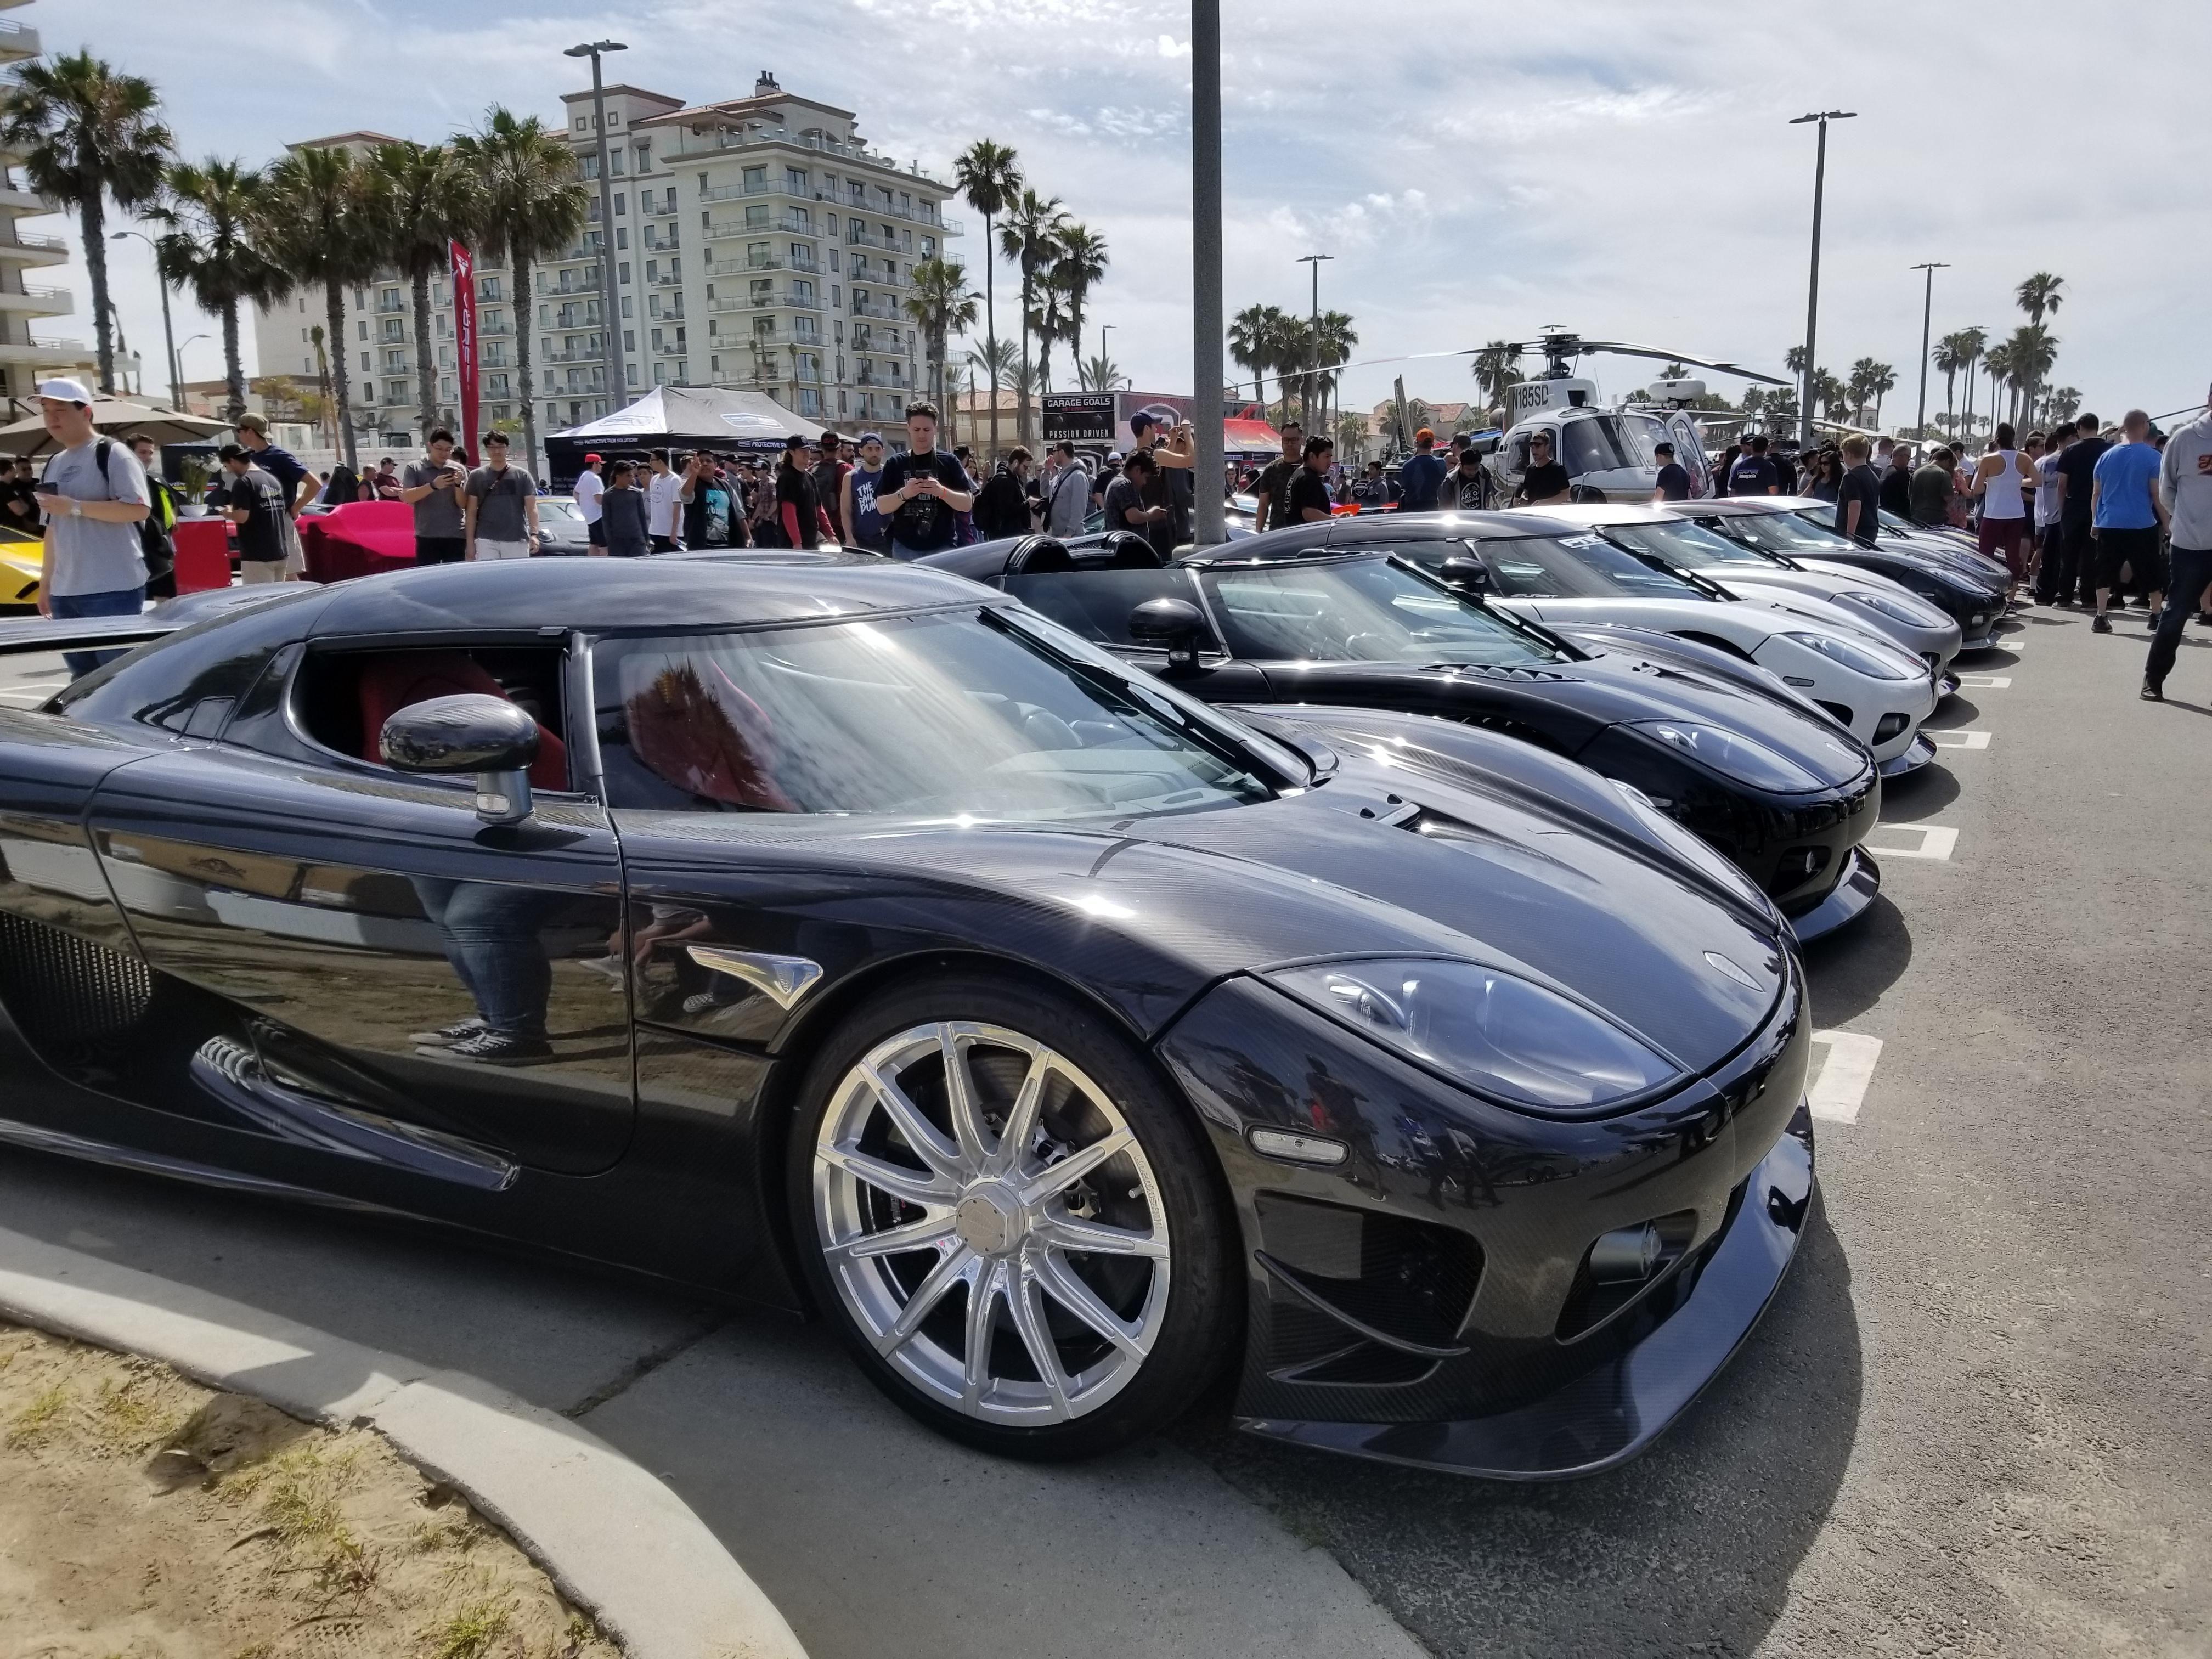 Koenigsegg Row Oc Koenigsegg Luxury Cars Sports Car